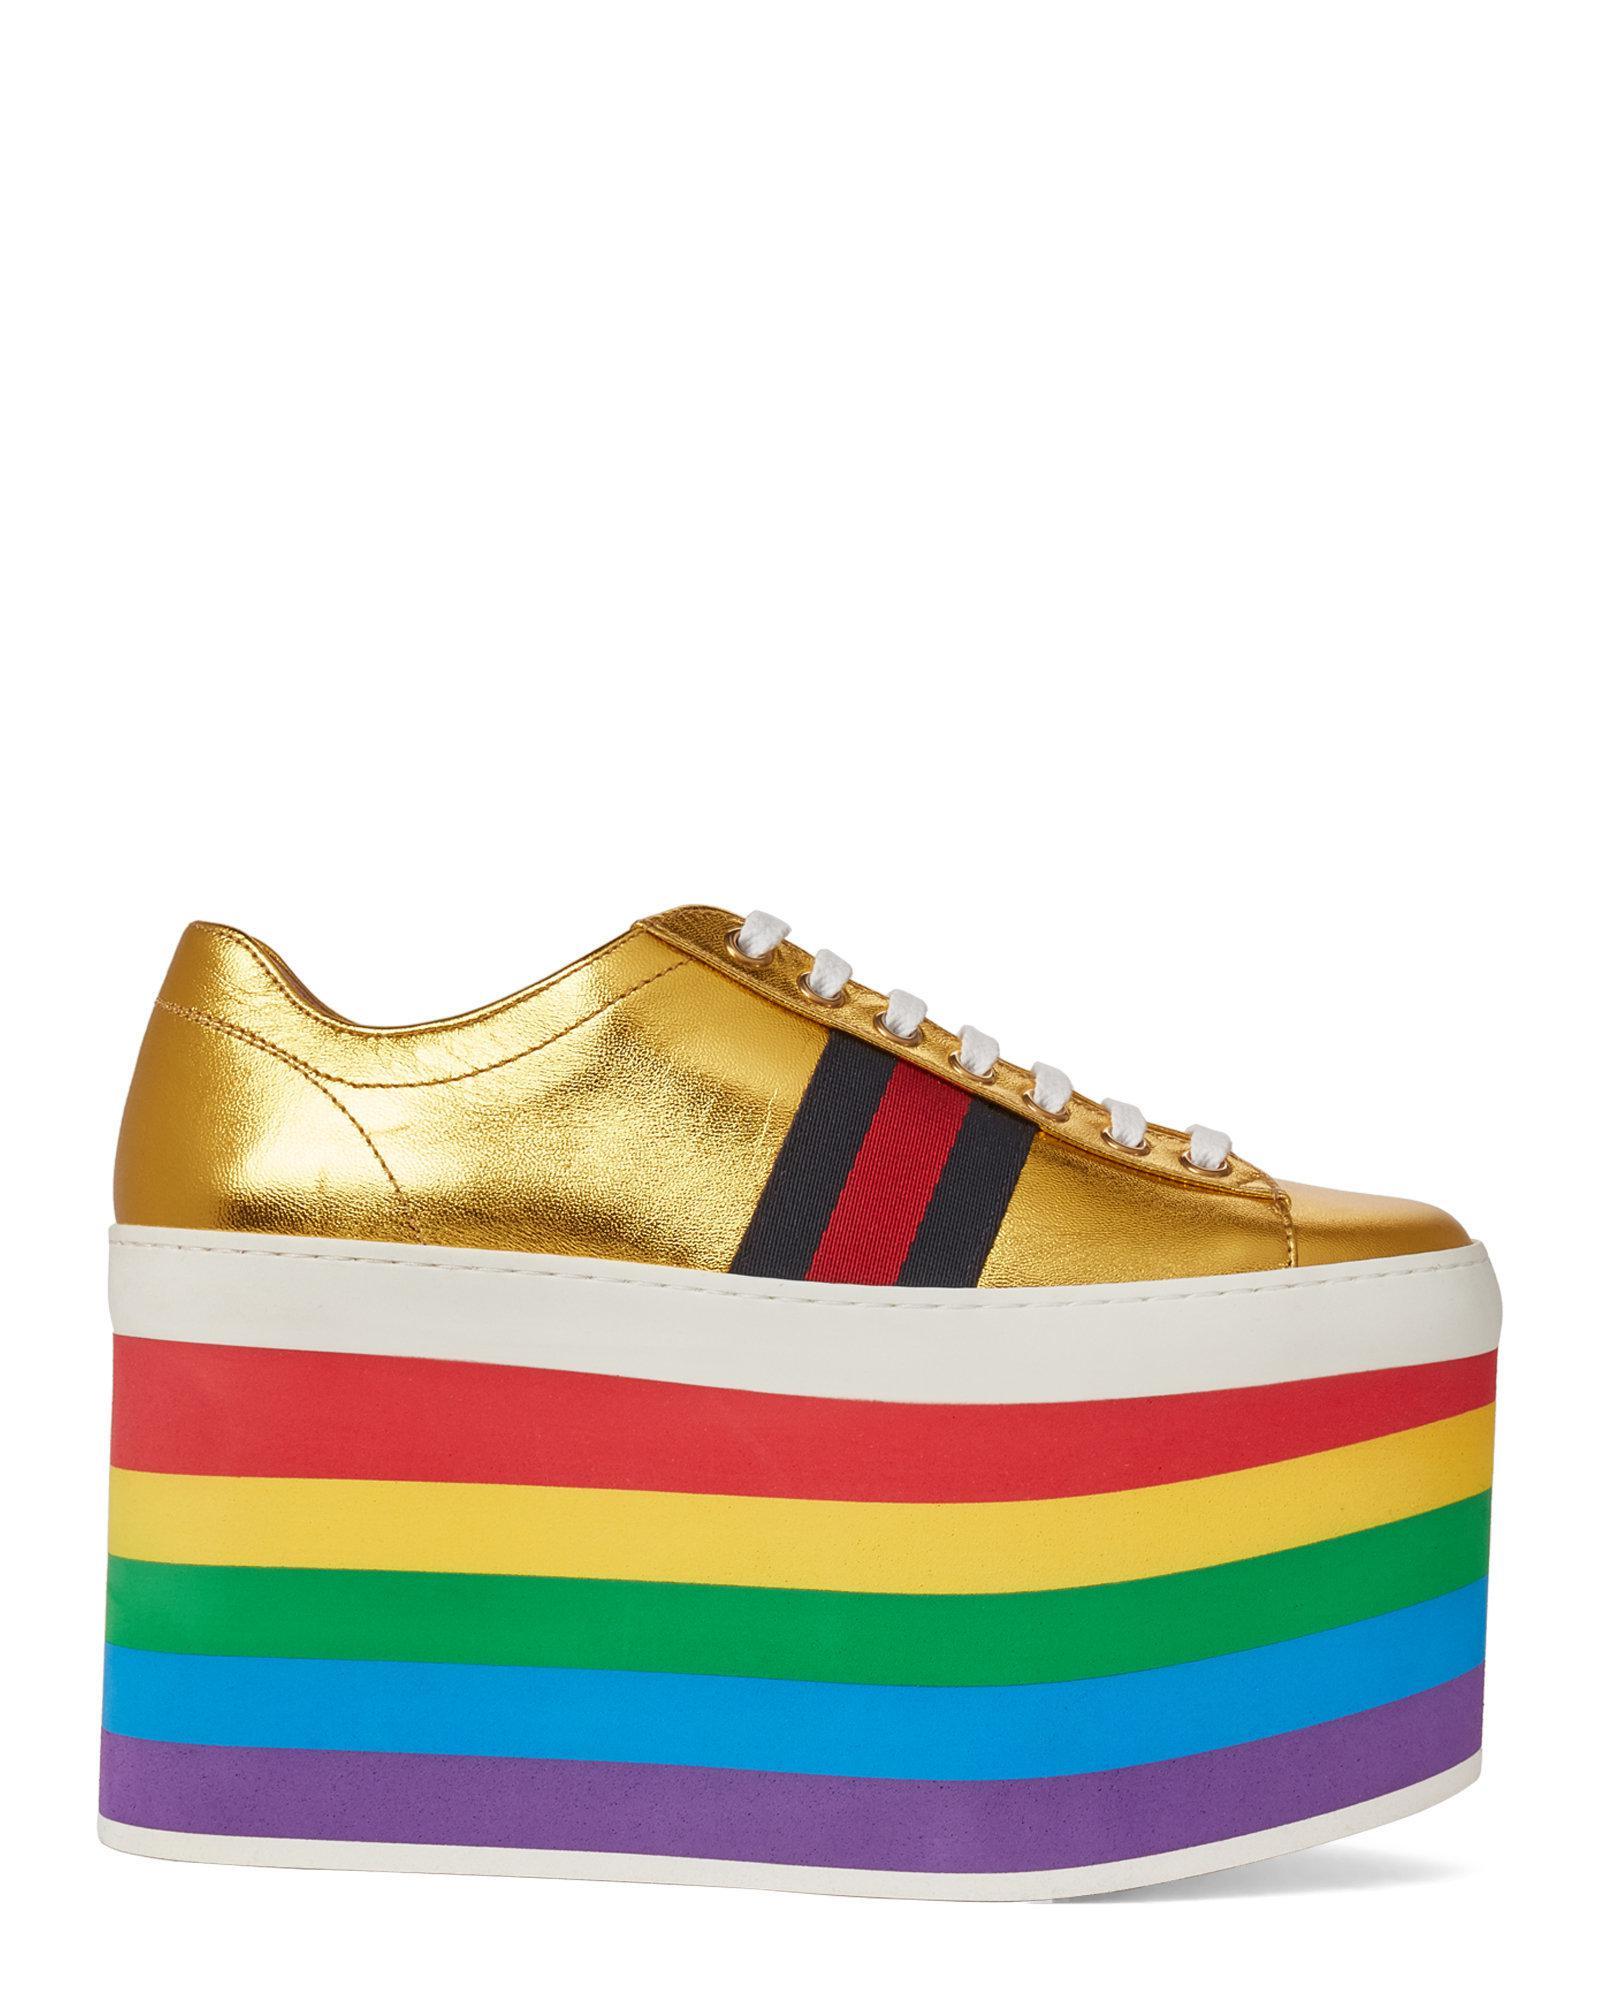 gucci platform rainbow - 60% OFF